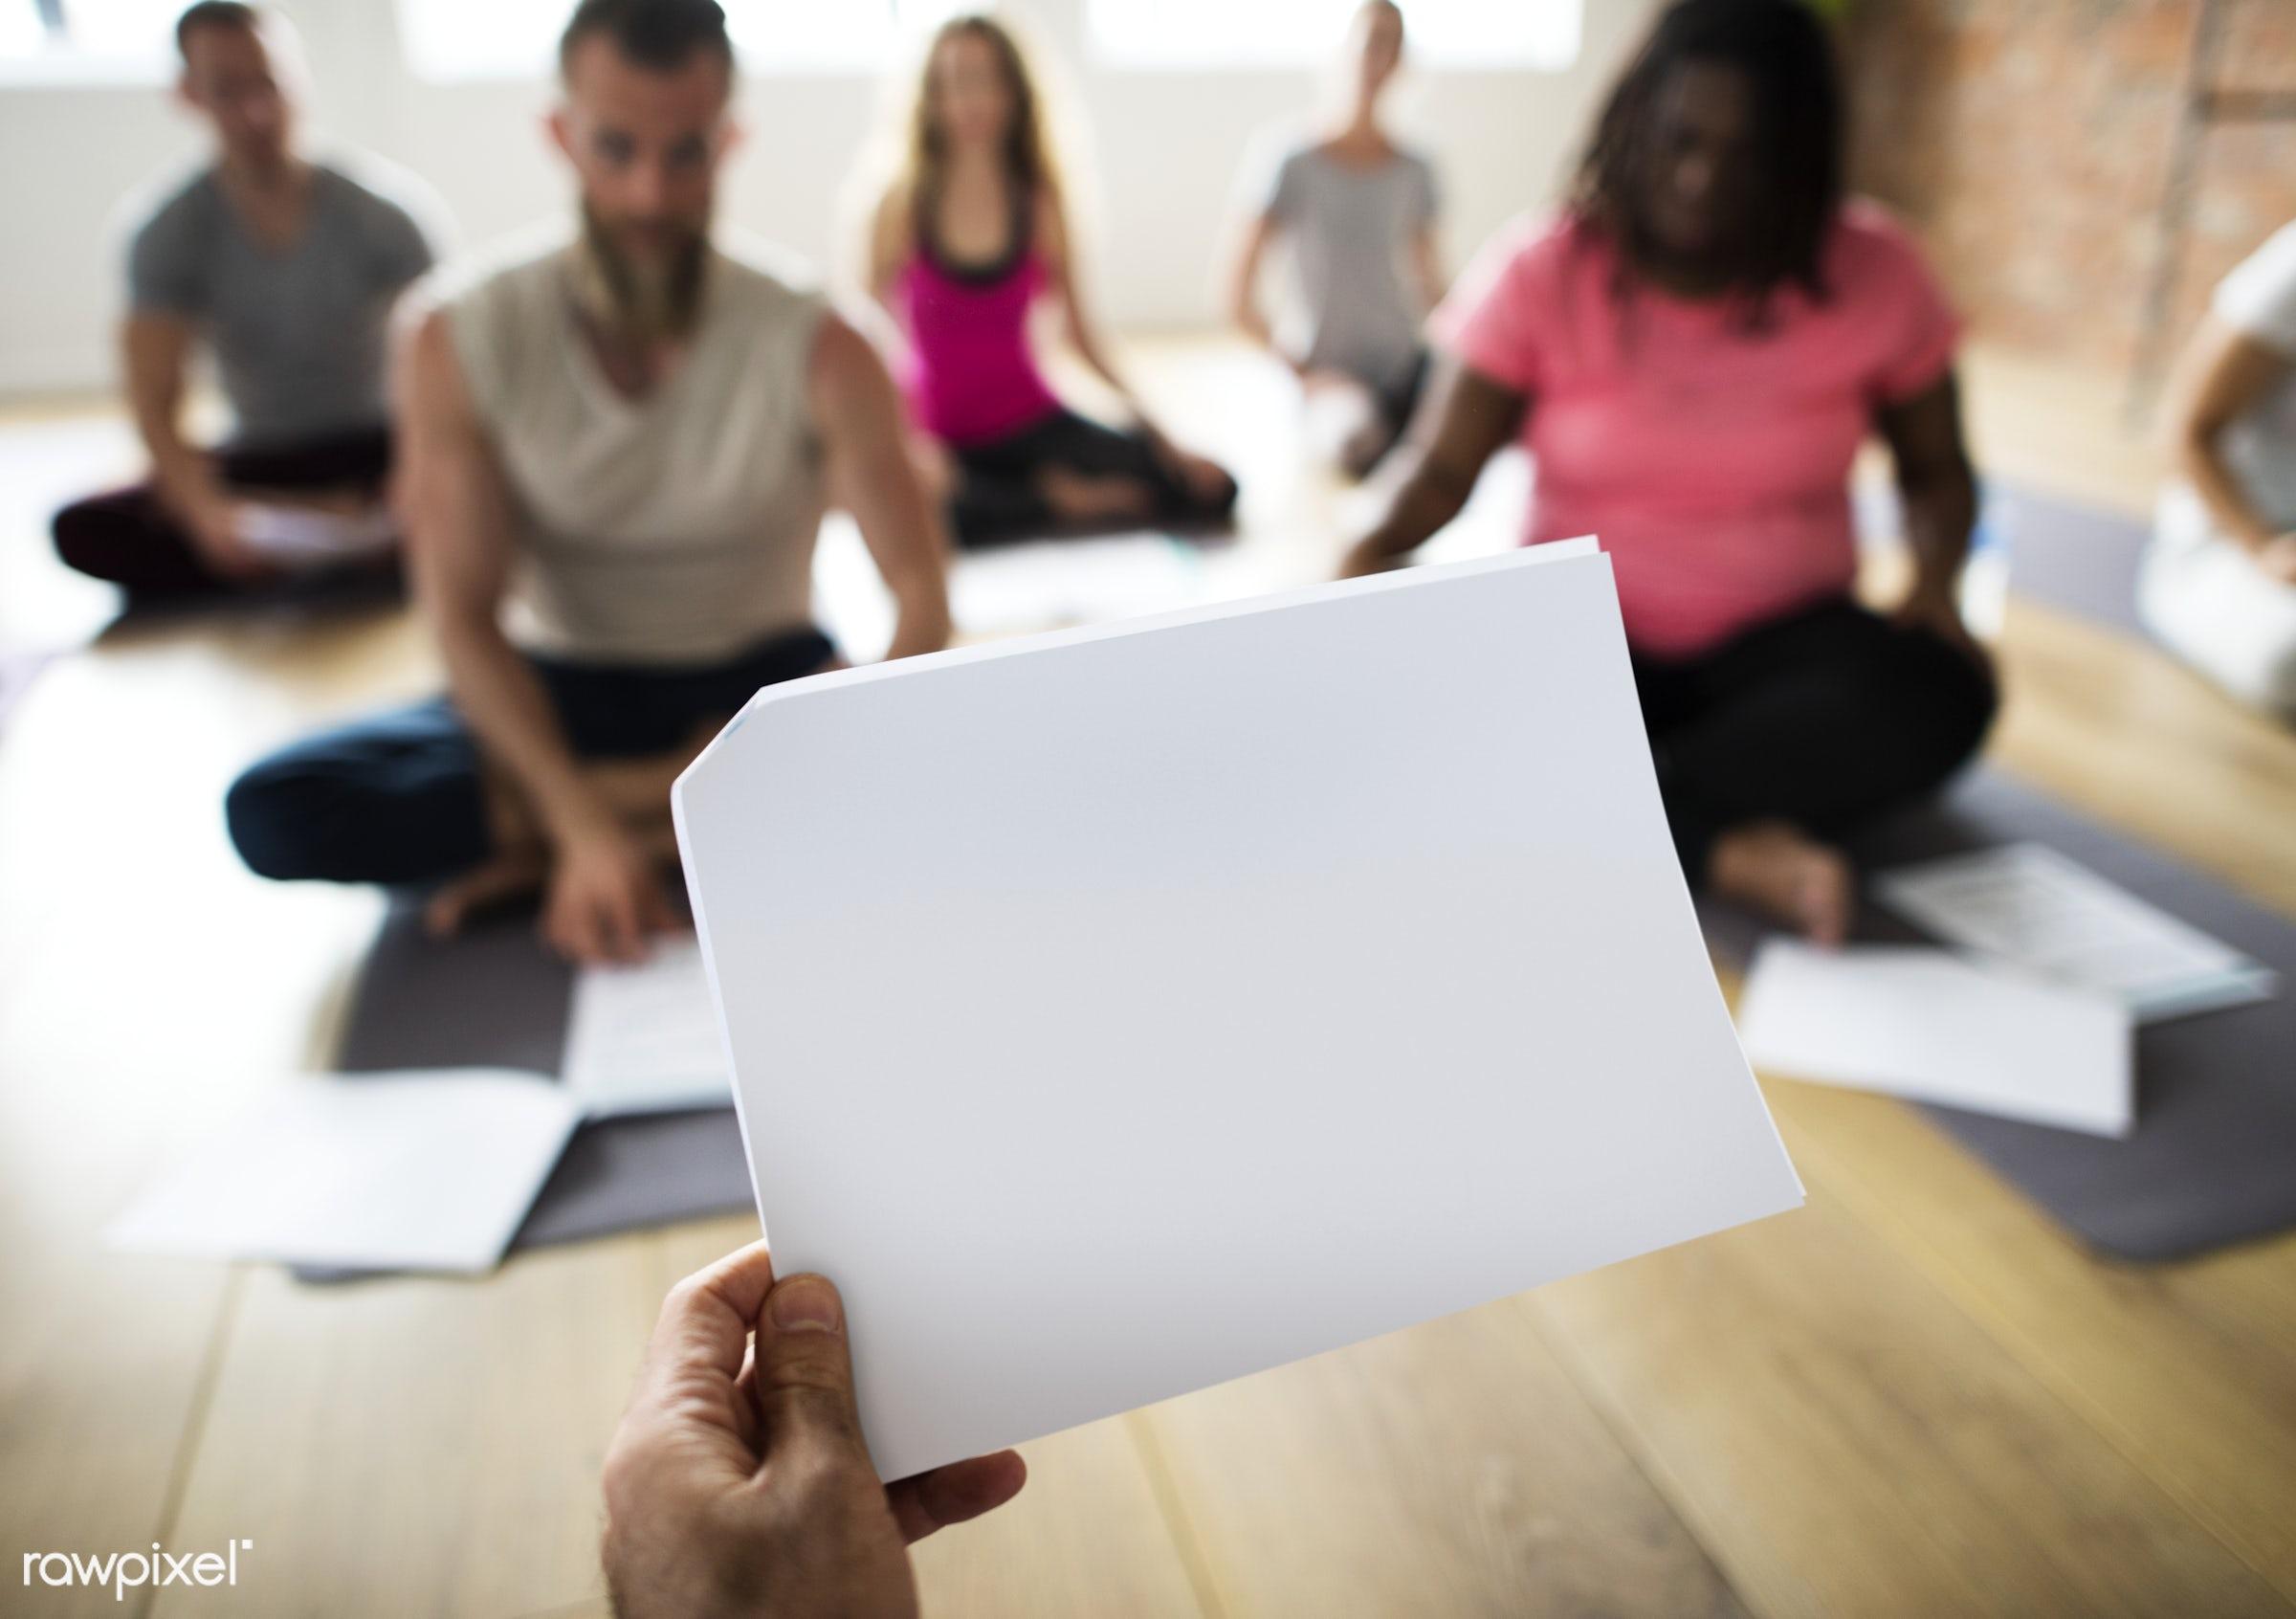 yoga, mock up, active, activity, balance, blank, class, contemplation, copy space, diverse, diversity, empty, exercise,...